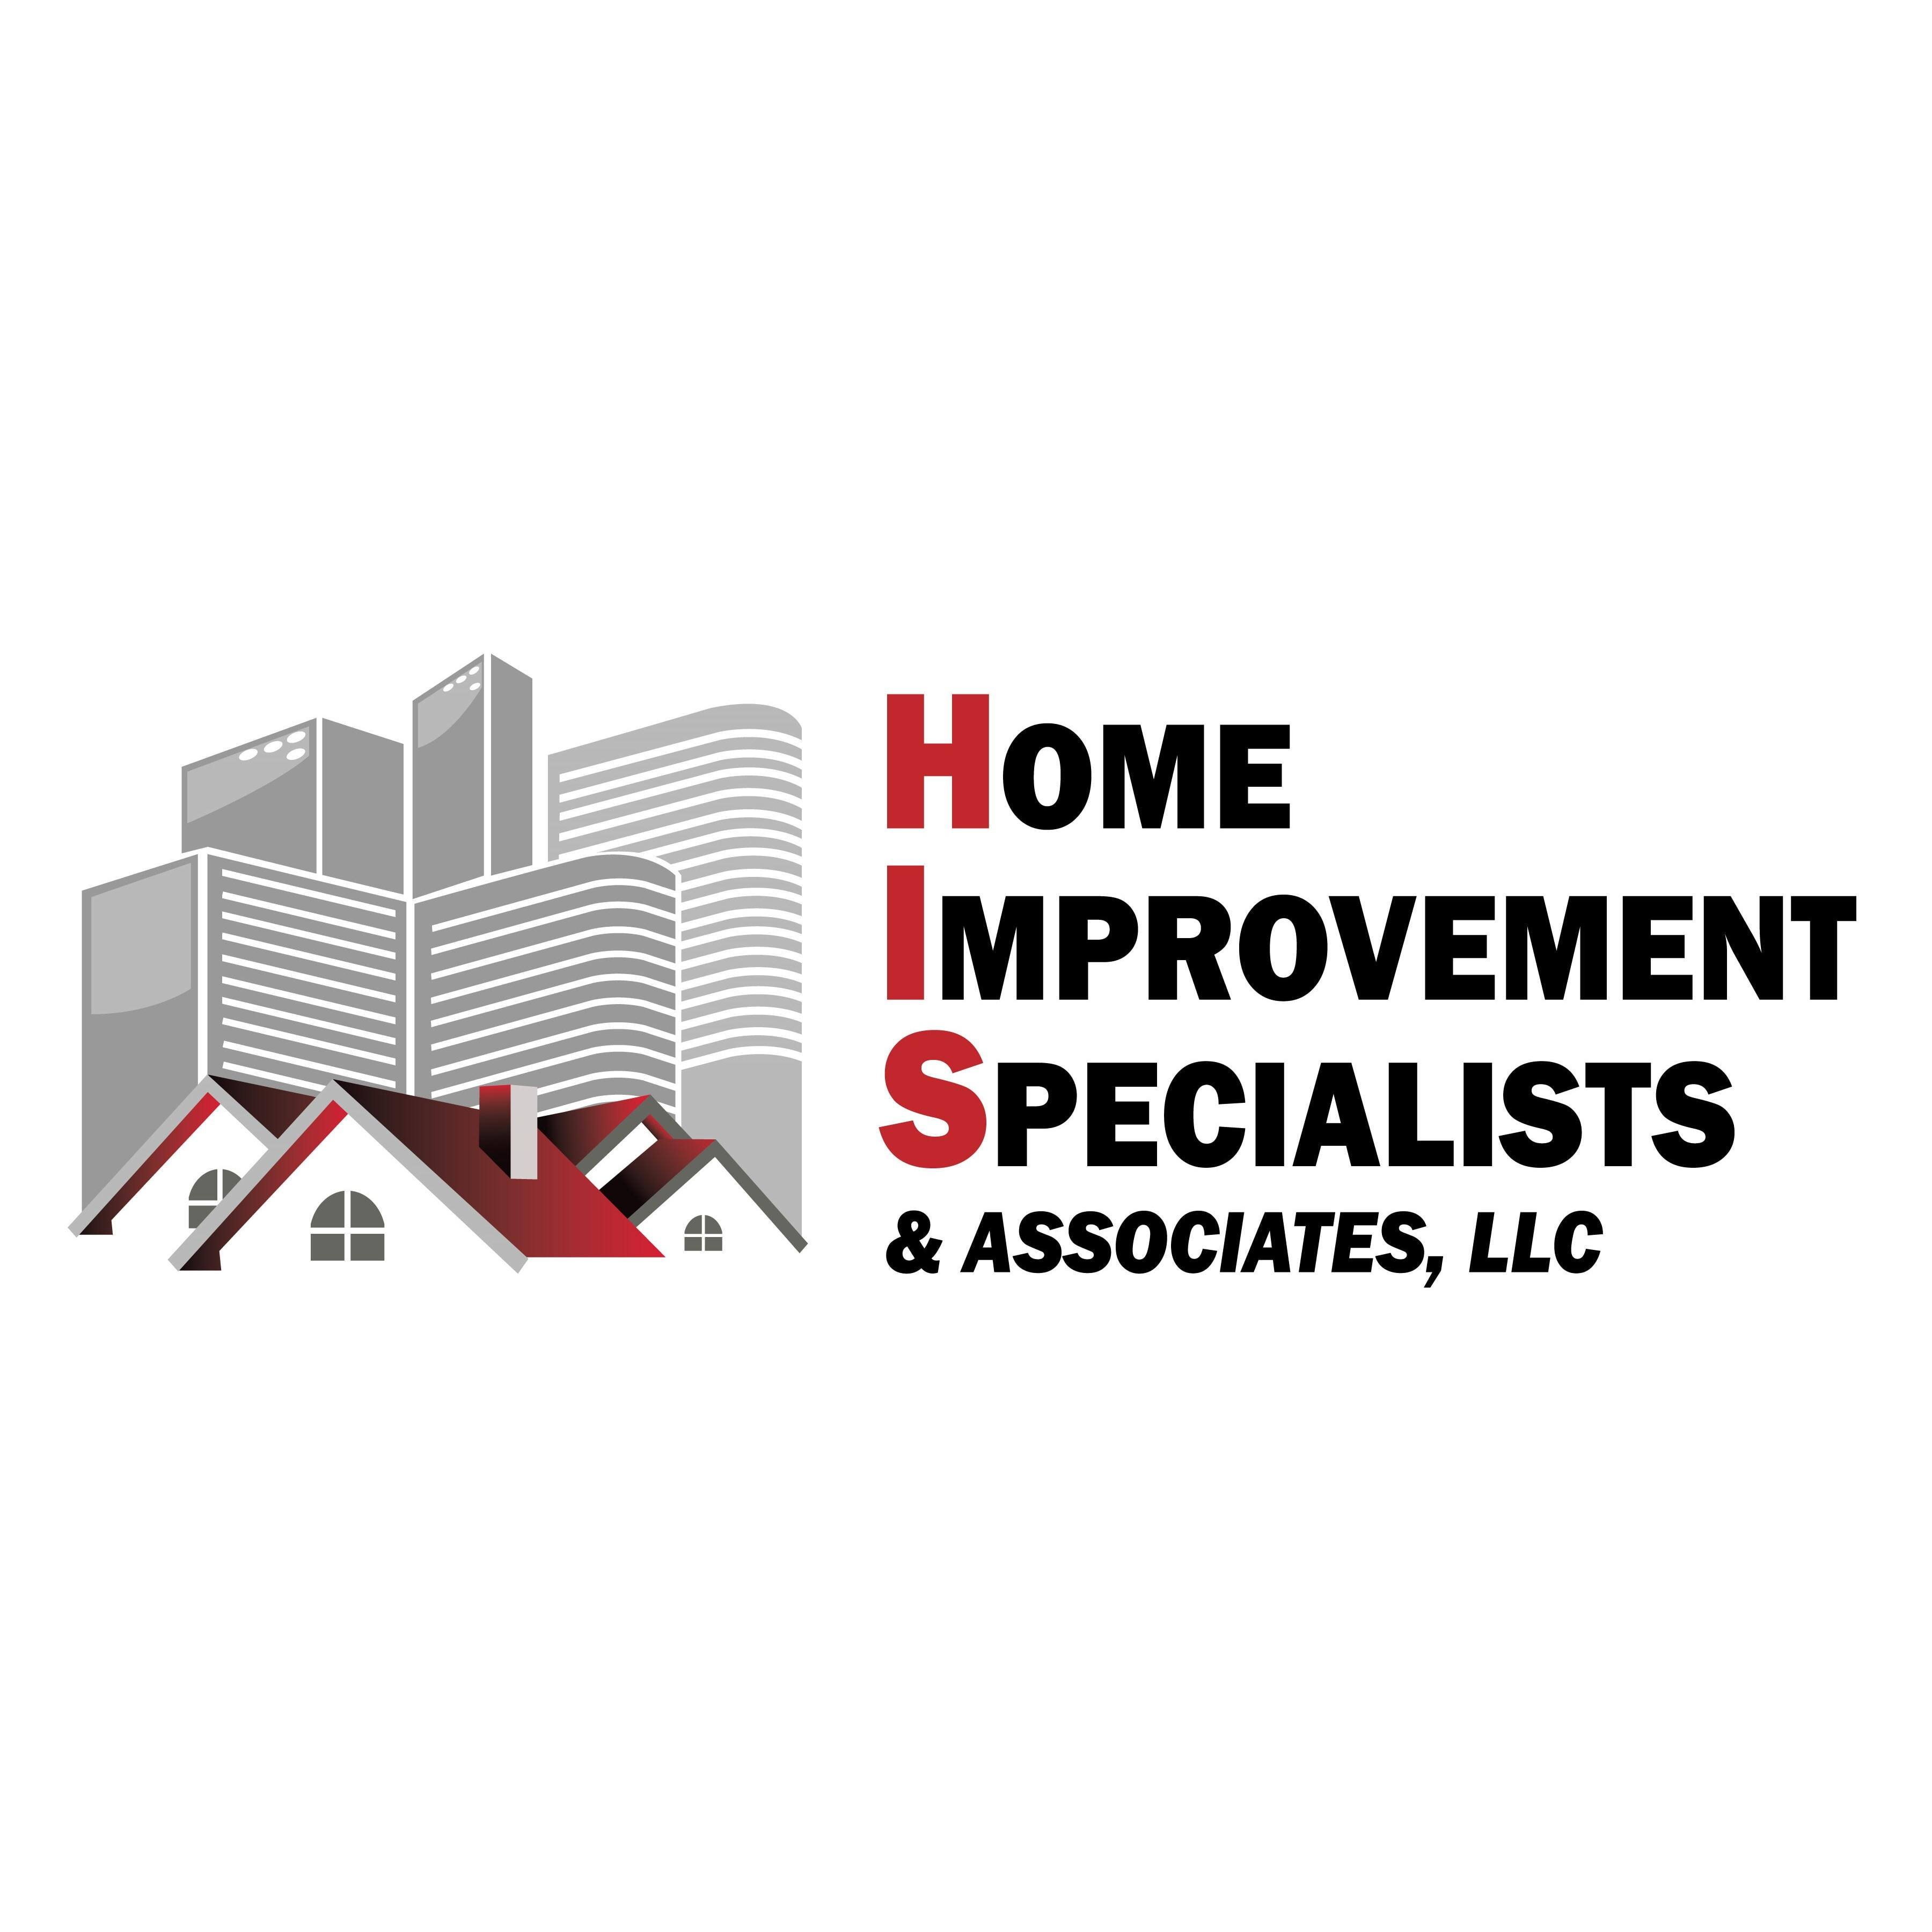 Home Improvement Specialists & Associates LLC